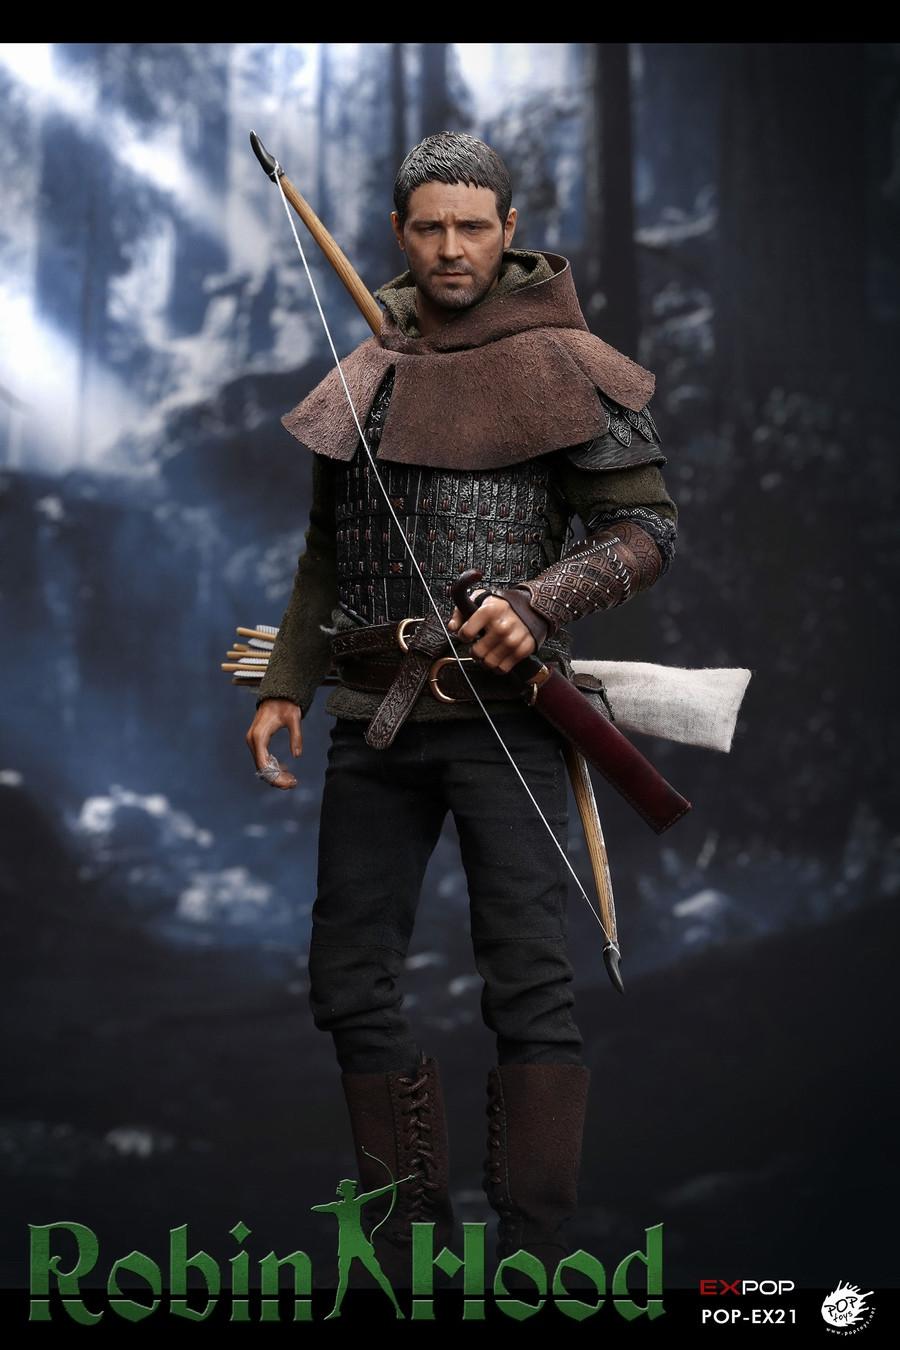 Pop Toys - Chivalrous Robin Hood